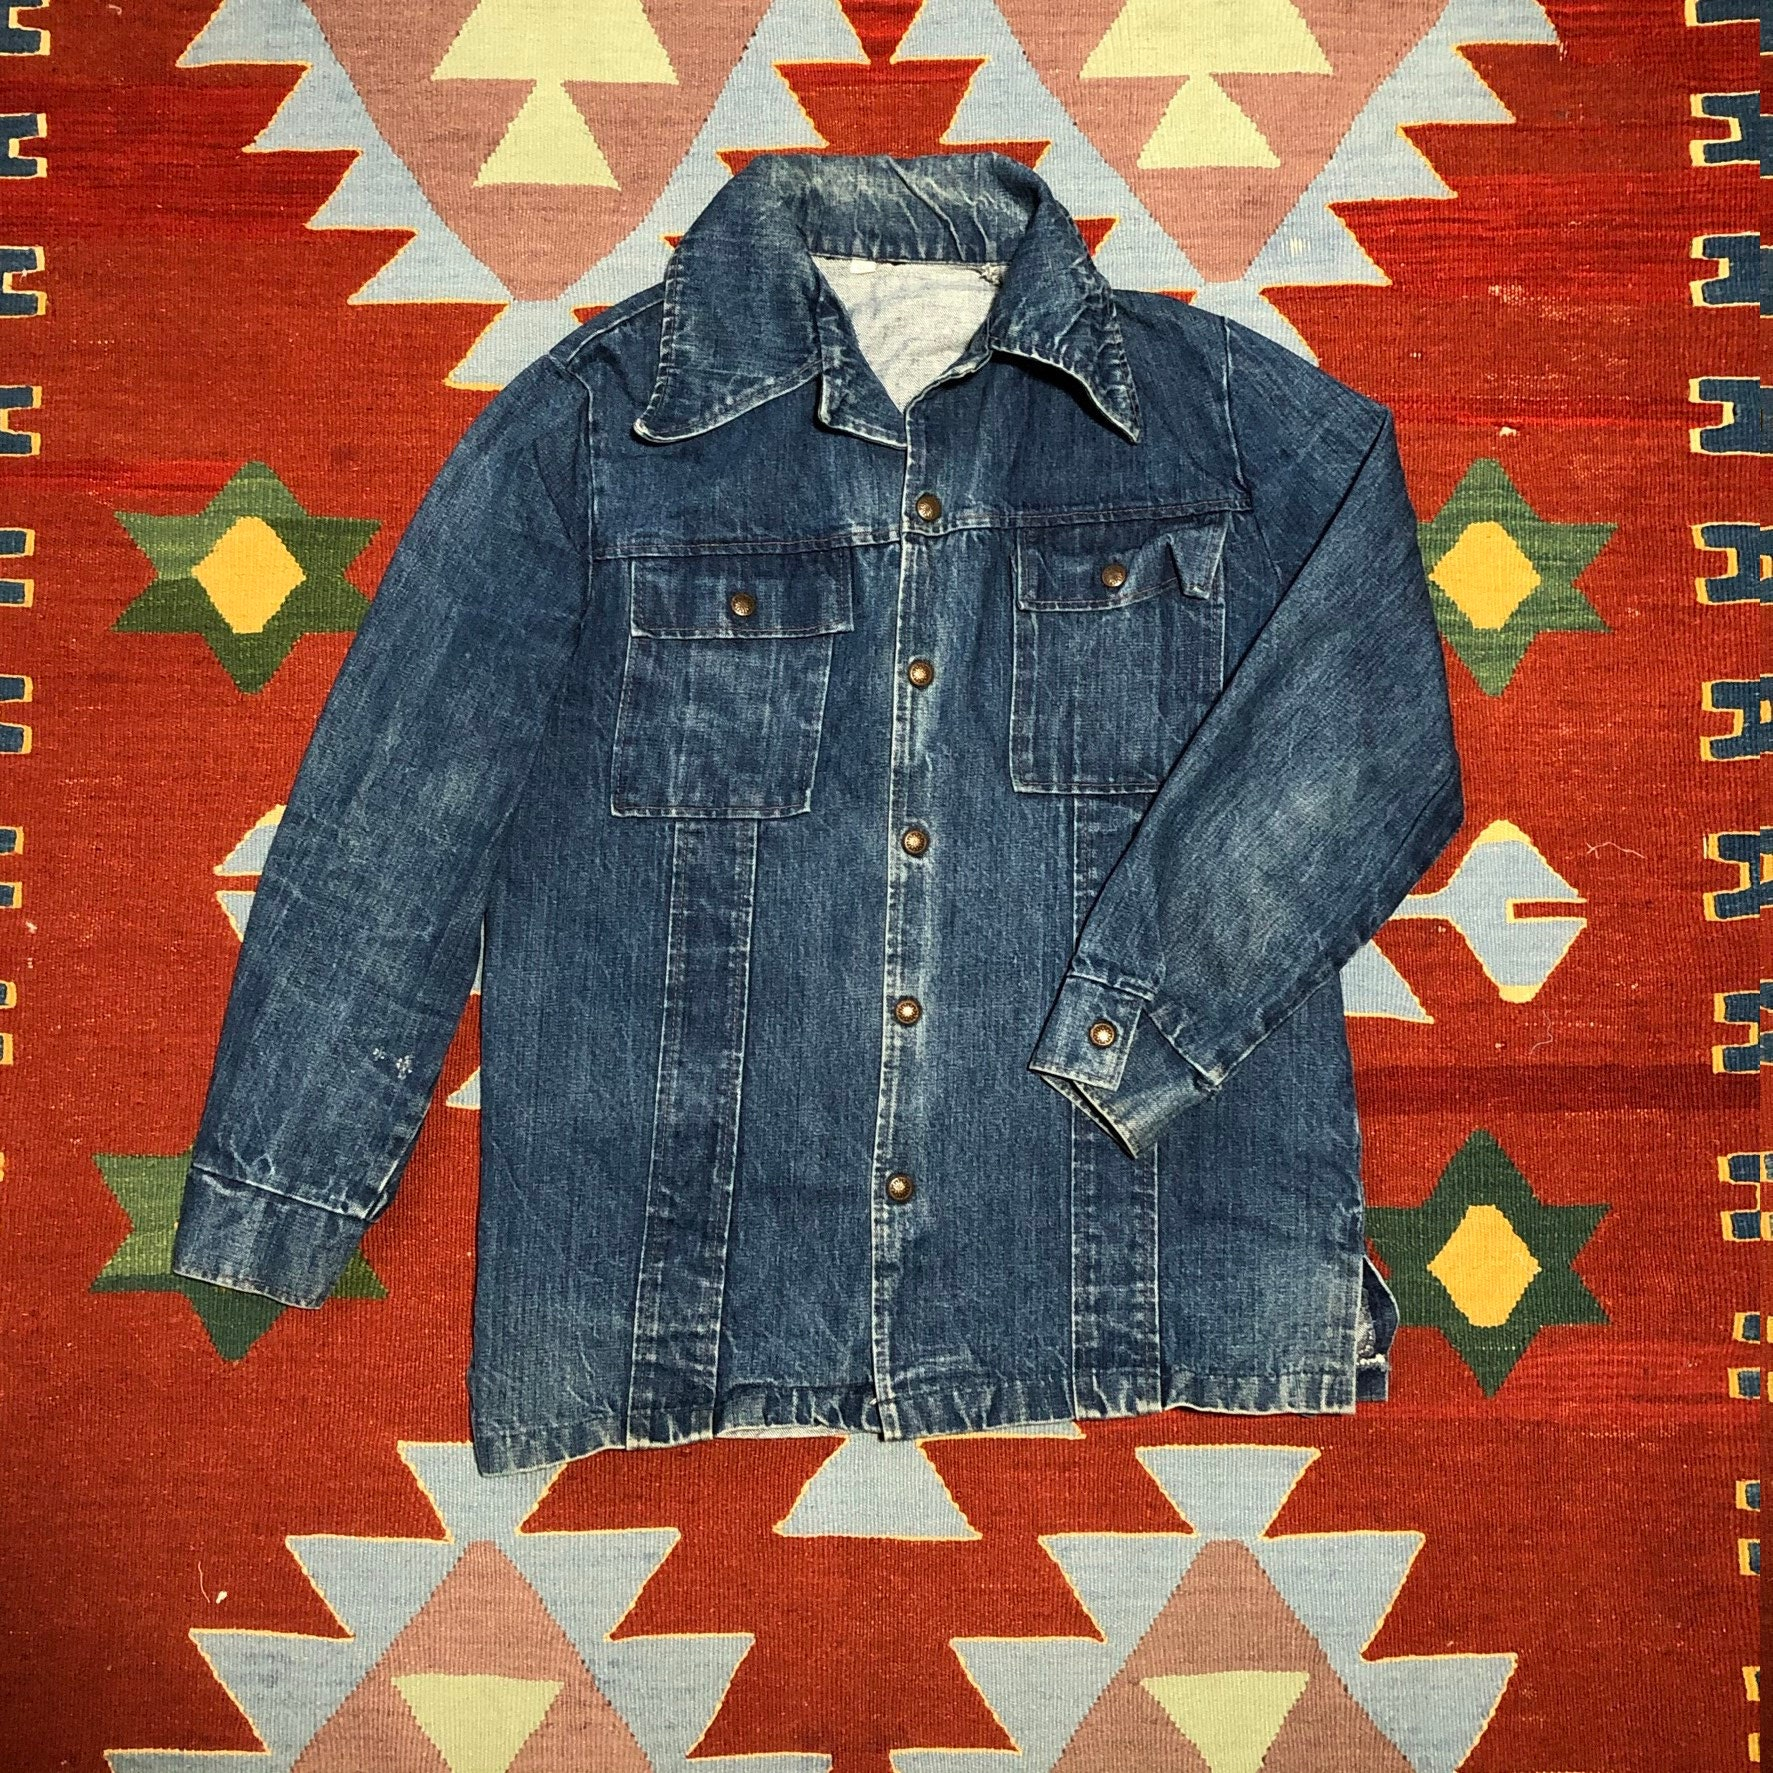 1970s Mens Shirt Styles – Vintage 70s Shirts for Guys Vintage 70S Denim Jacket Indigo Jc Penney Size 40 Mens Medium Blue Chore Coat $0.00 AT vintagedancer.com